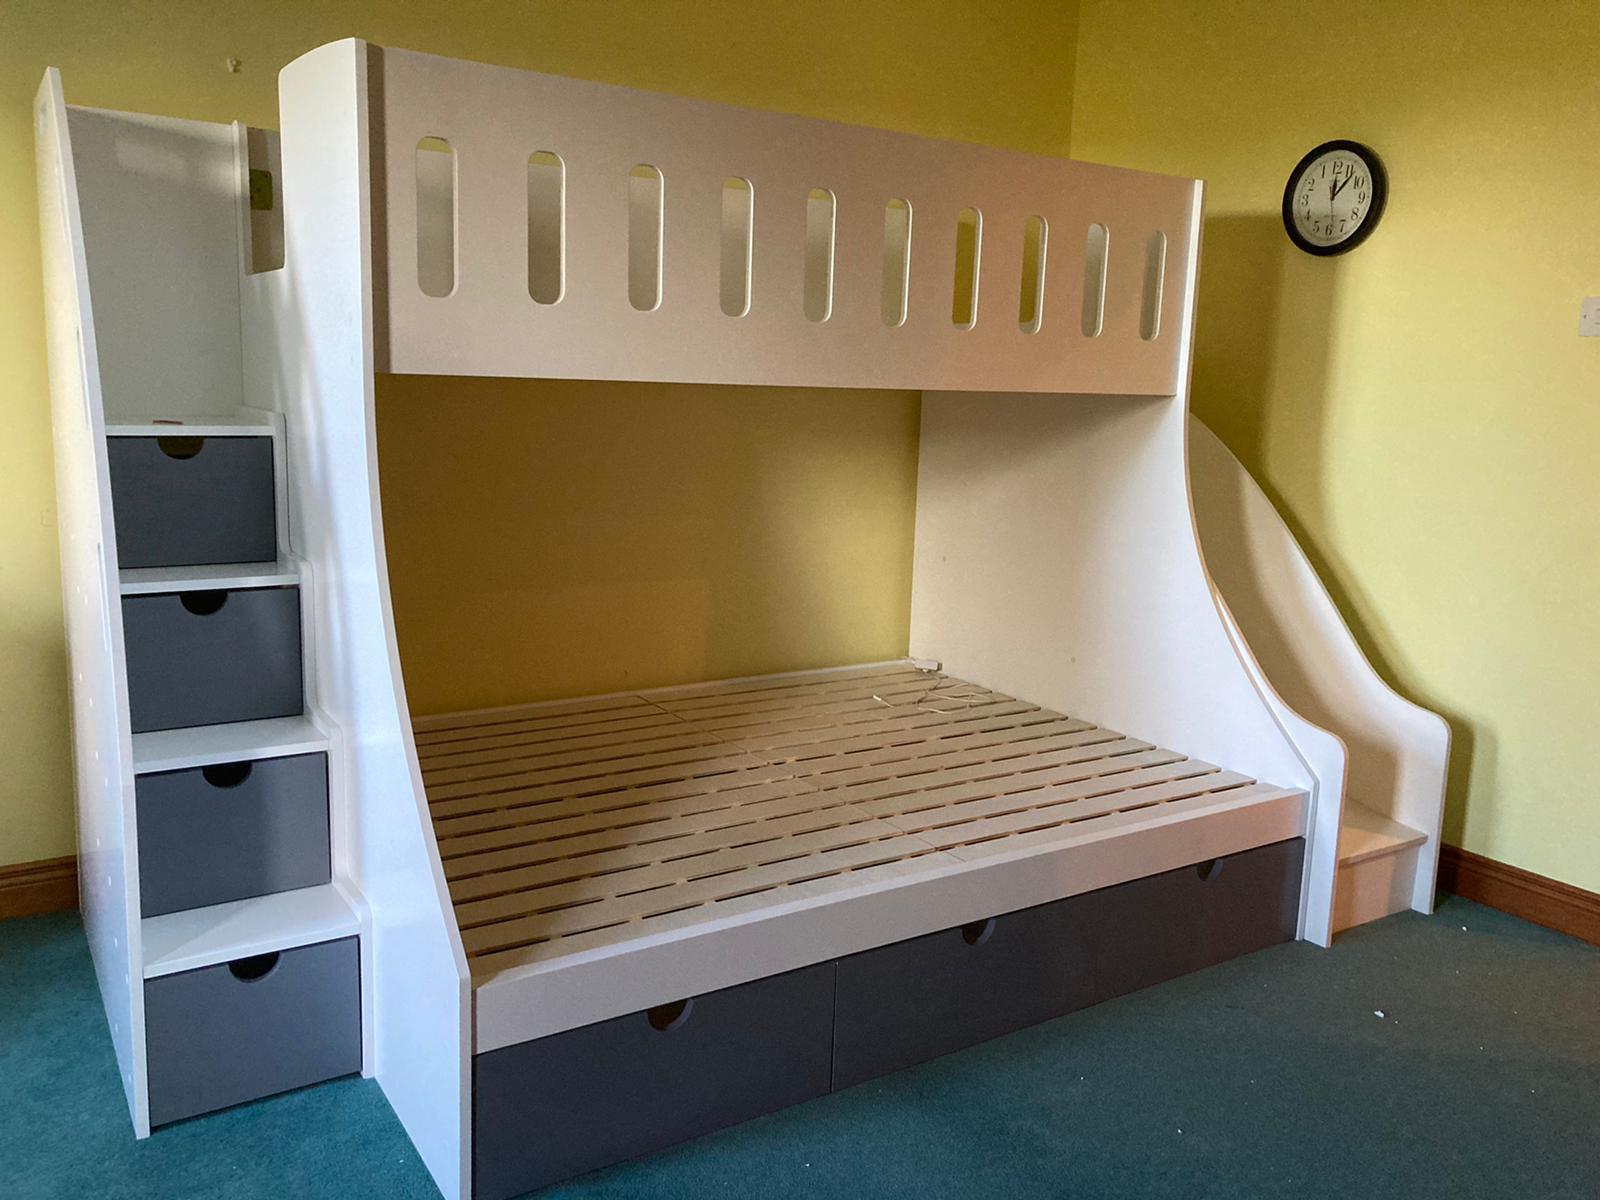 How to Custom Make Kids Beds